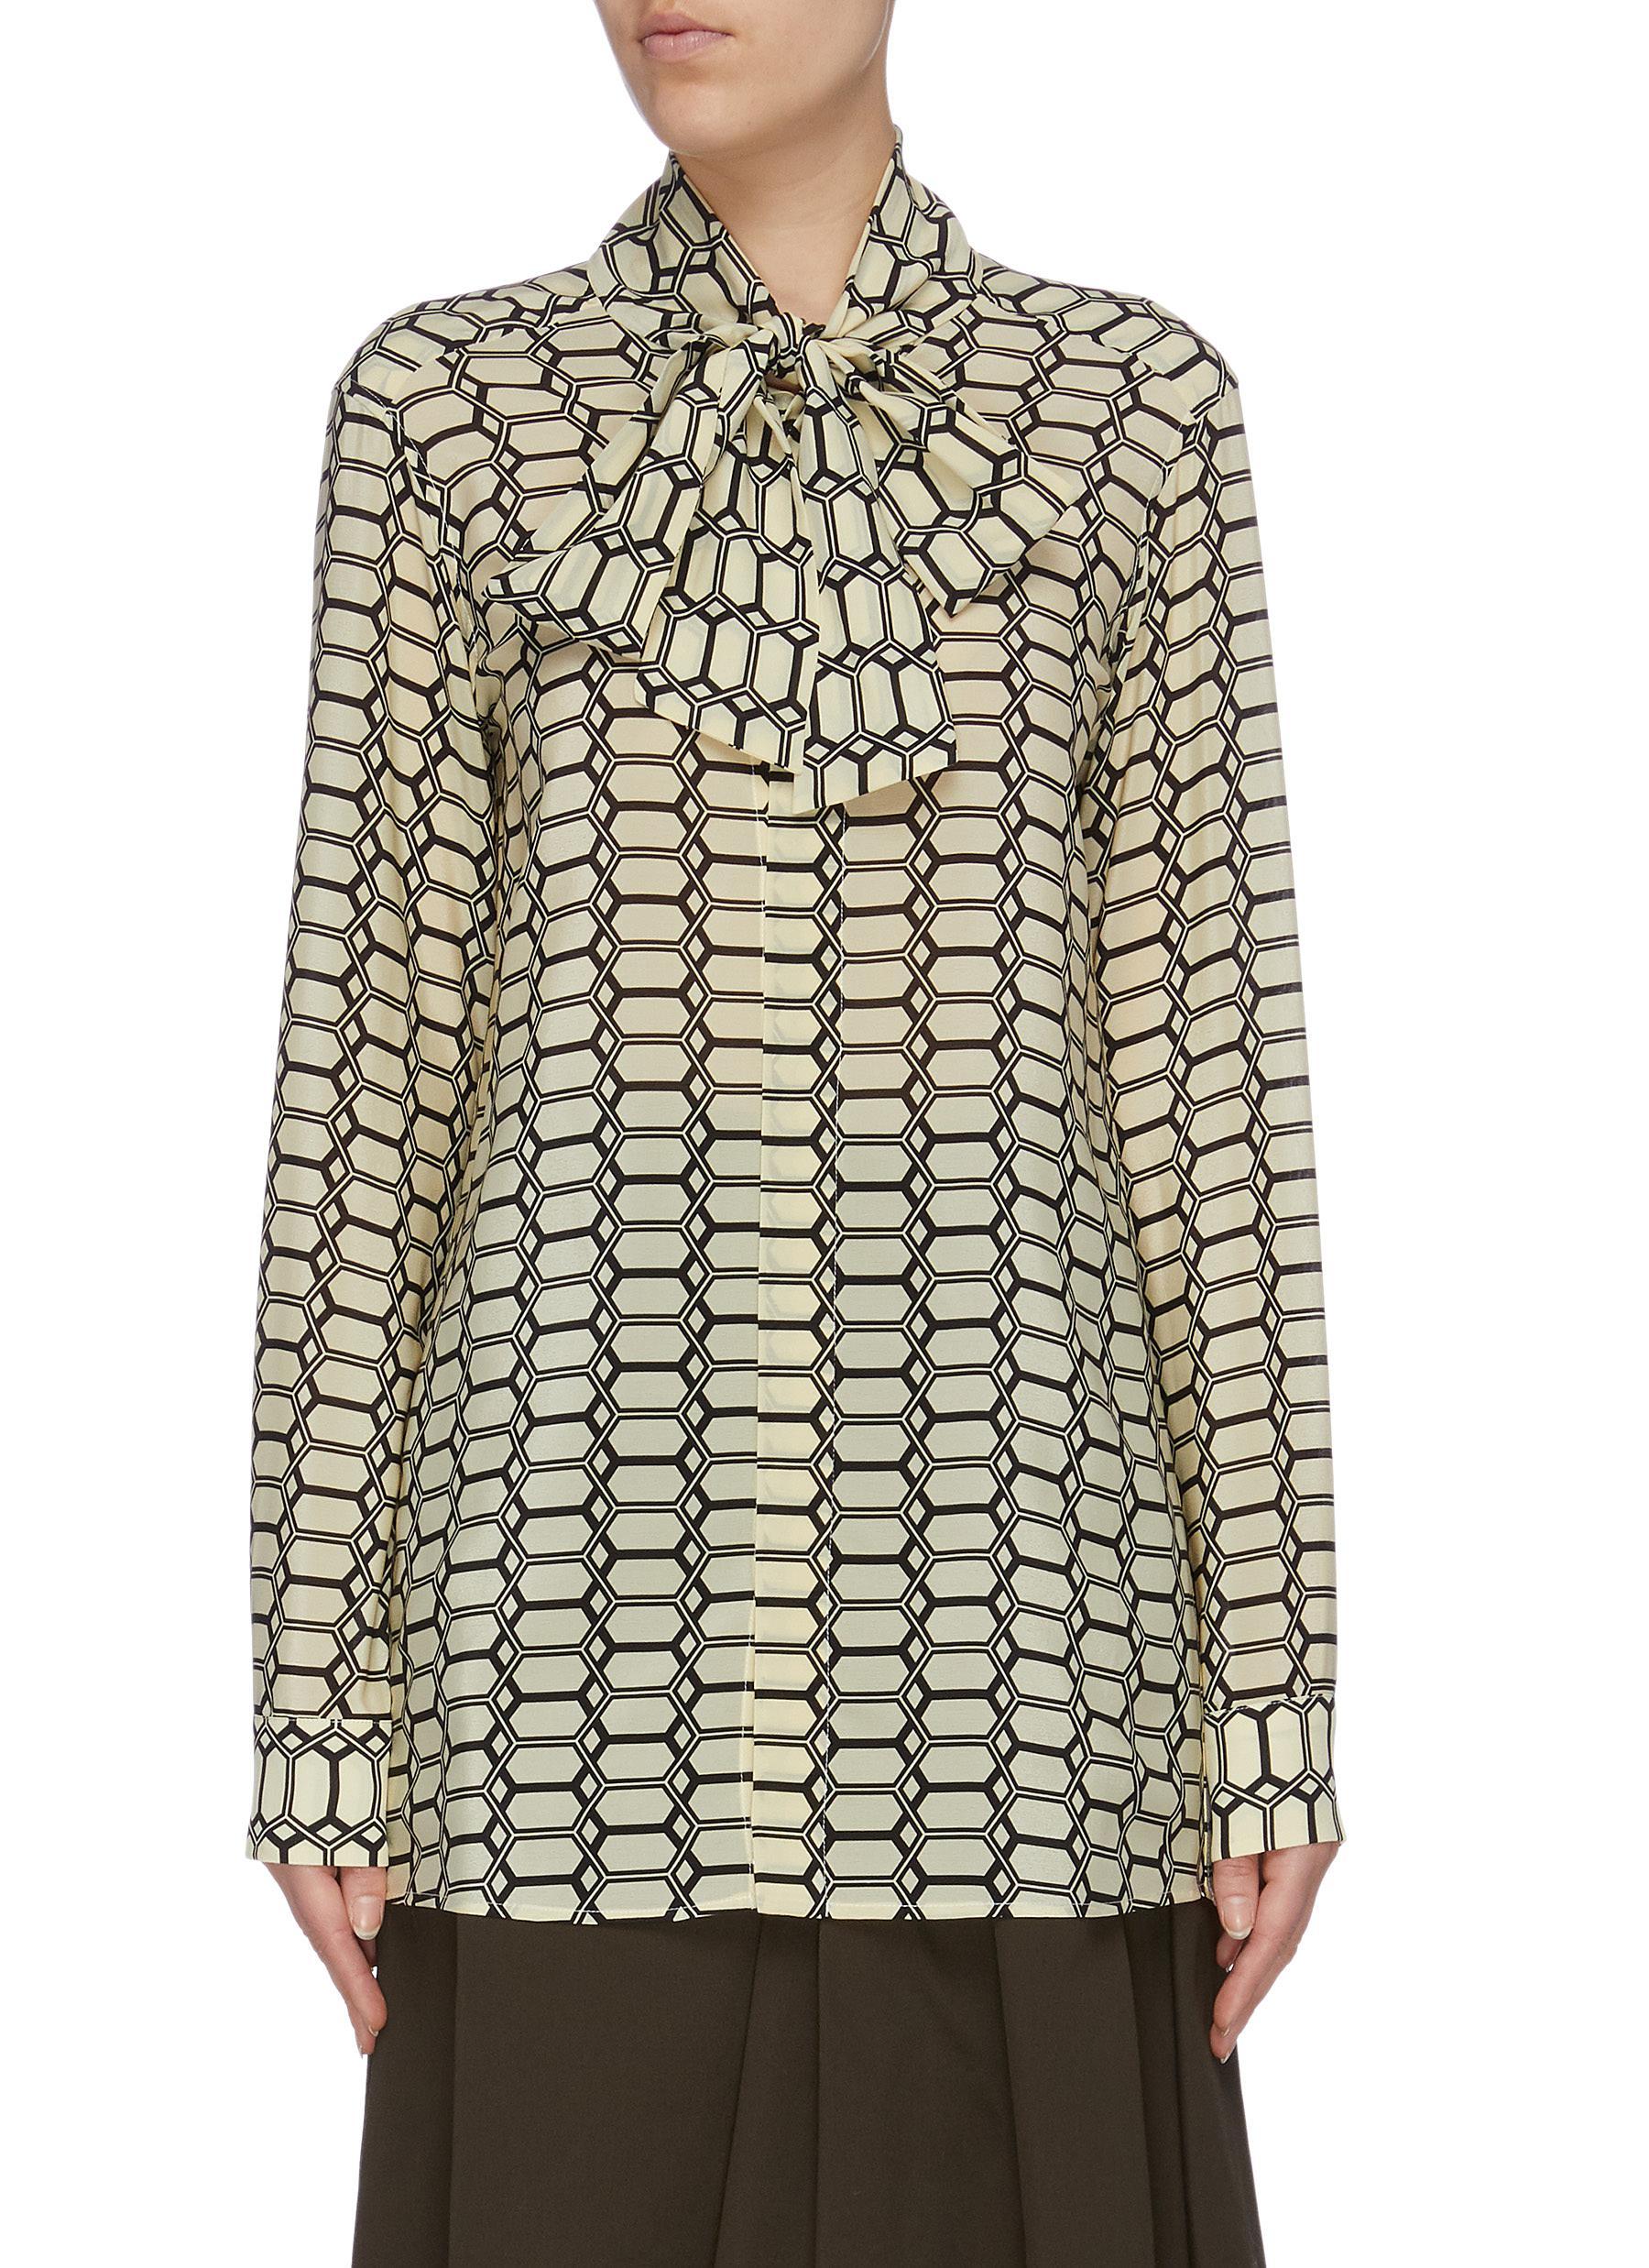 Geometric print silk crepe pussybow blouse by Plan C